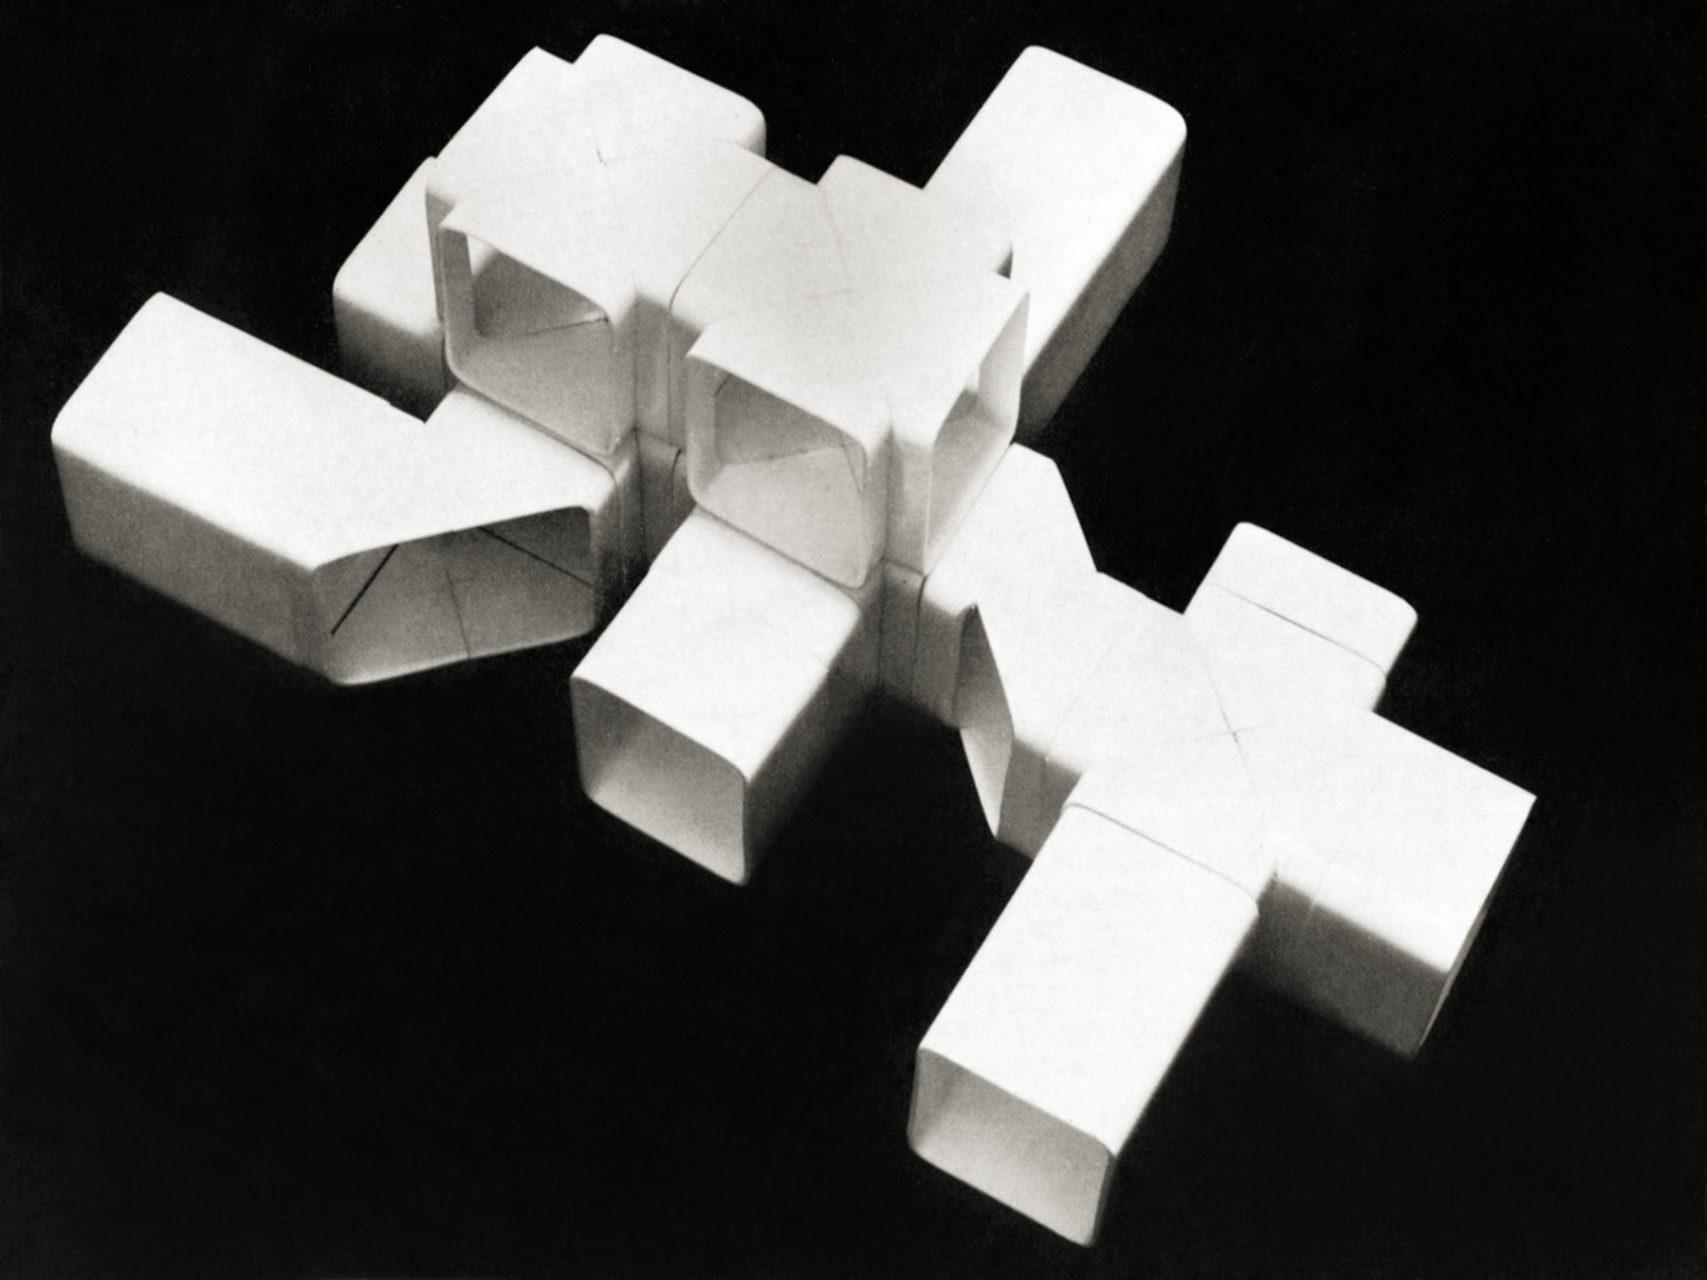 Saša J. Mächtig: Systems. Structures. Strategies.. K67 System-Elemente, Kunststoffmodel von 1966